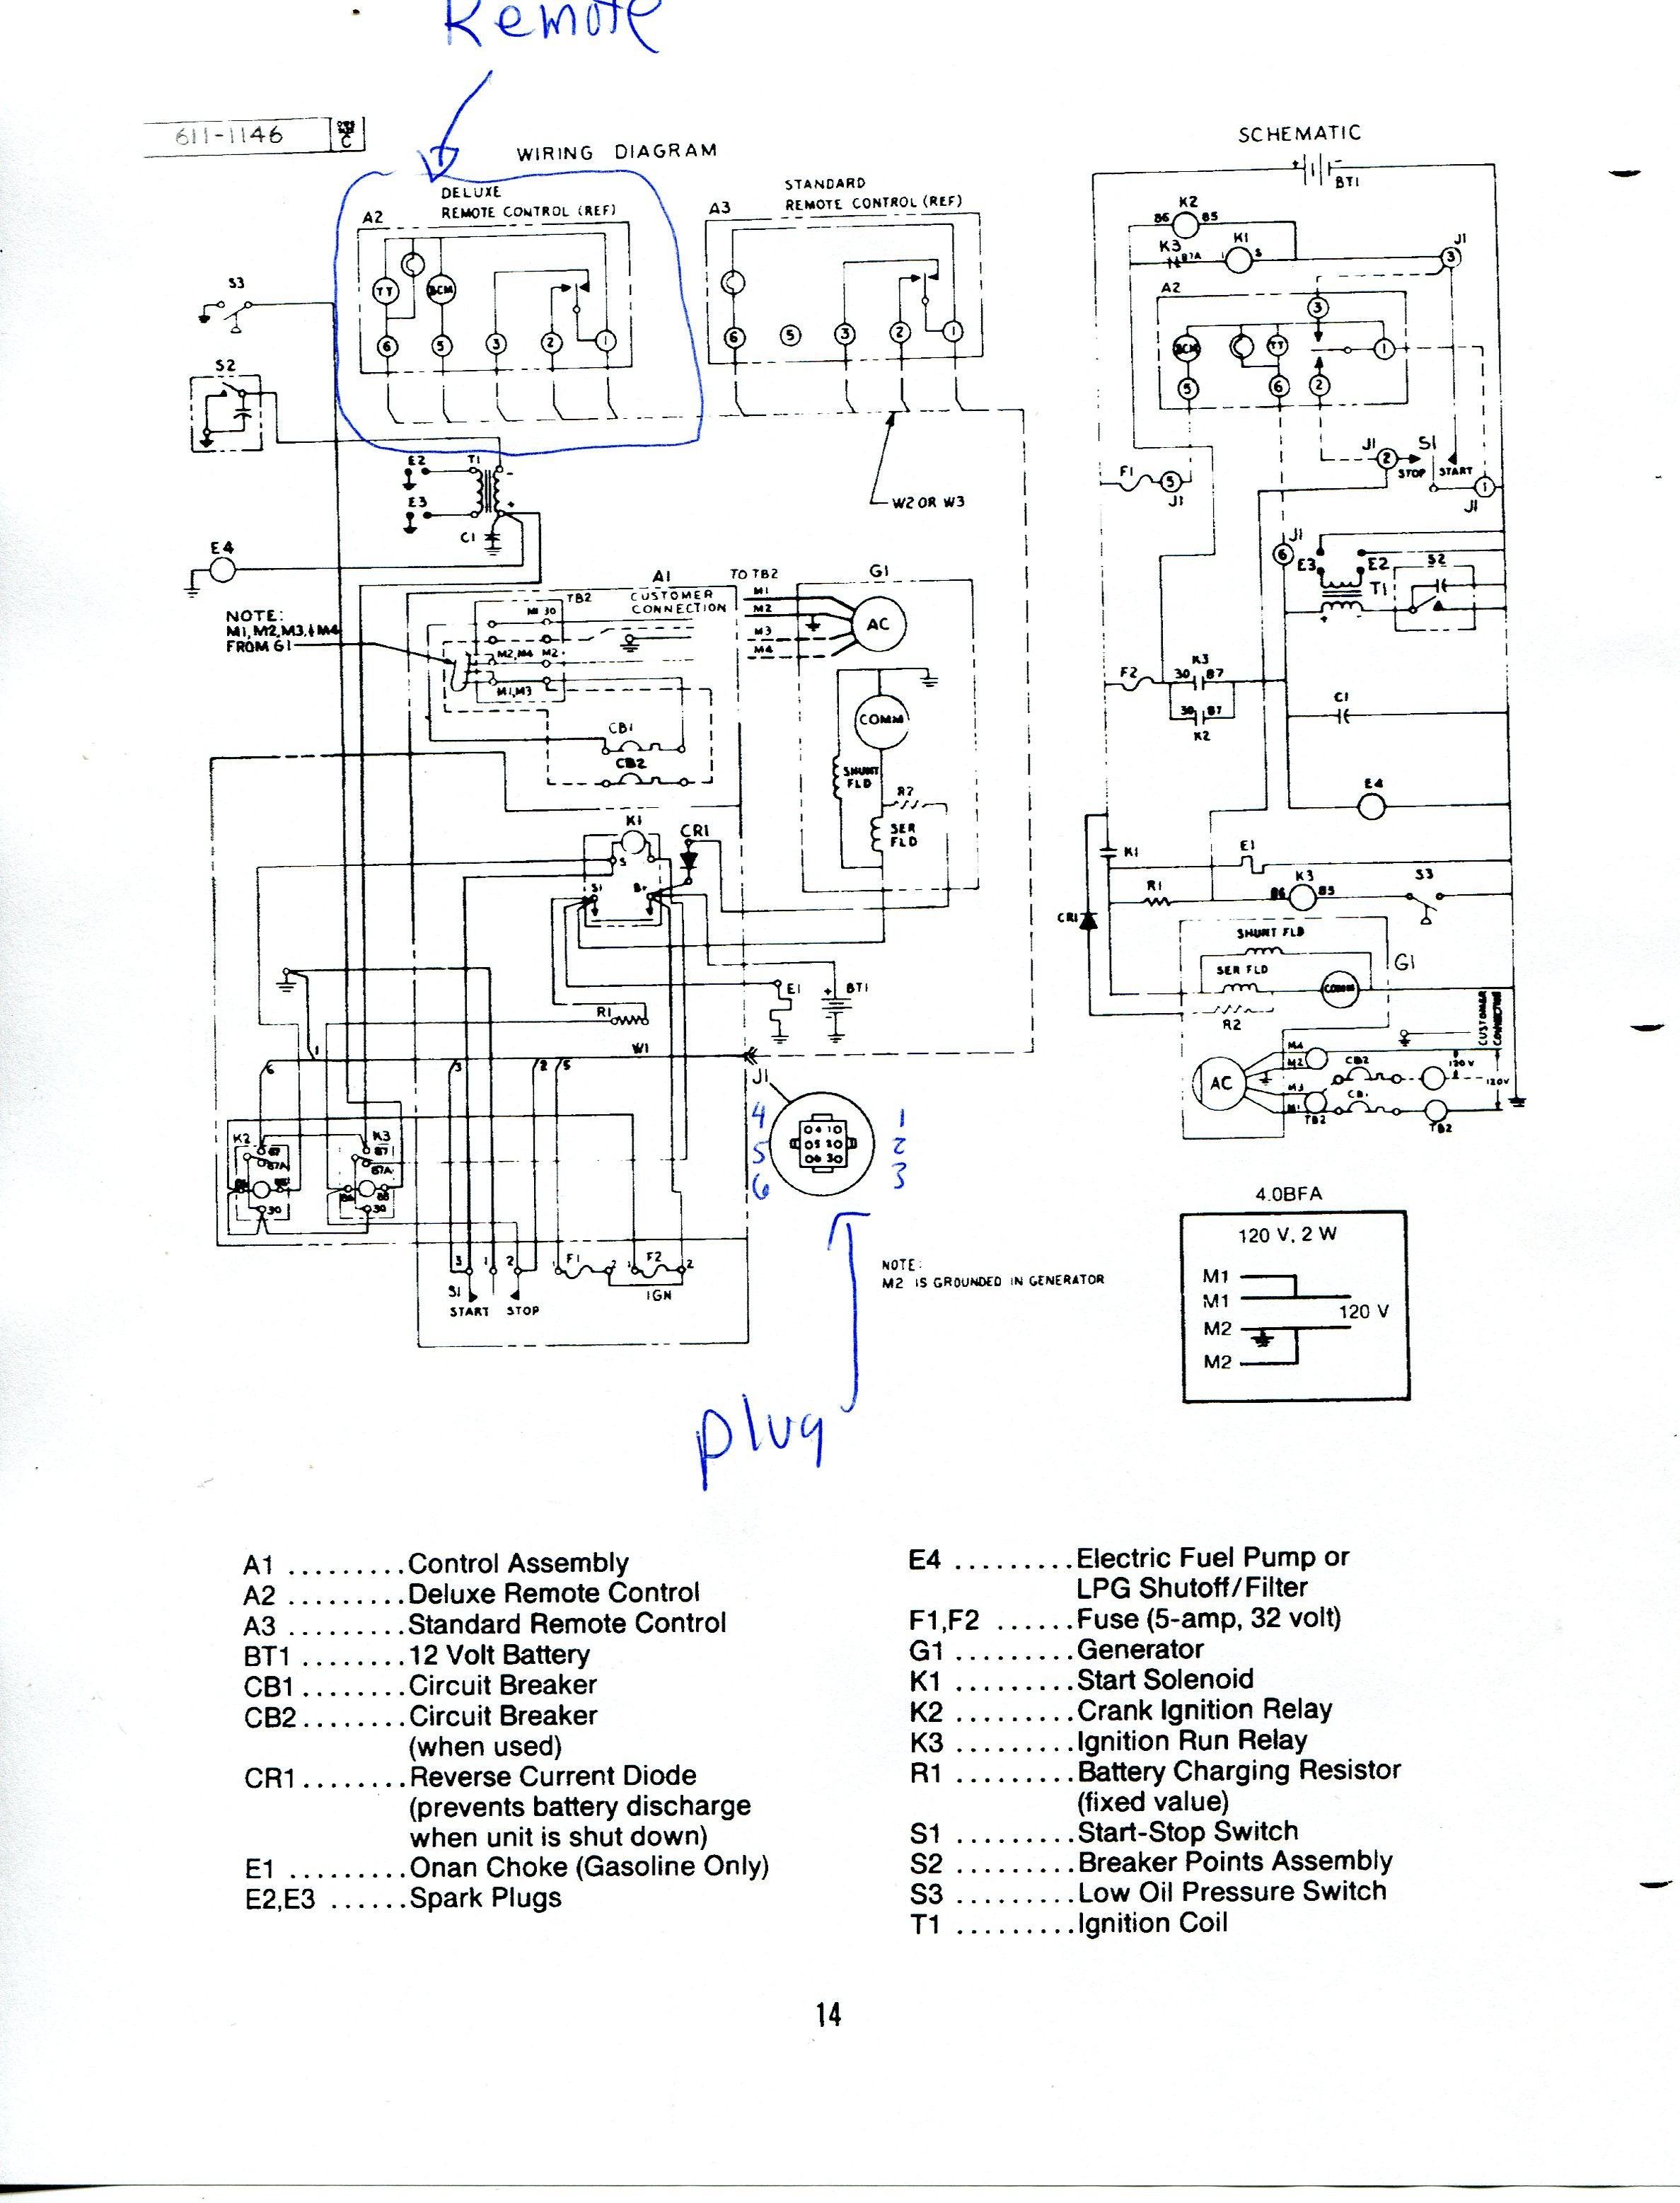 Golight Wiring Diagram from i.pinimg.com